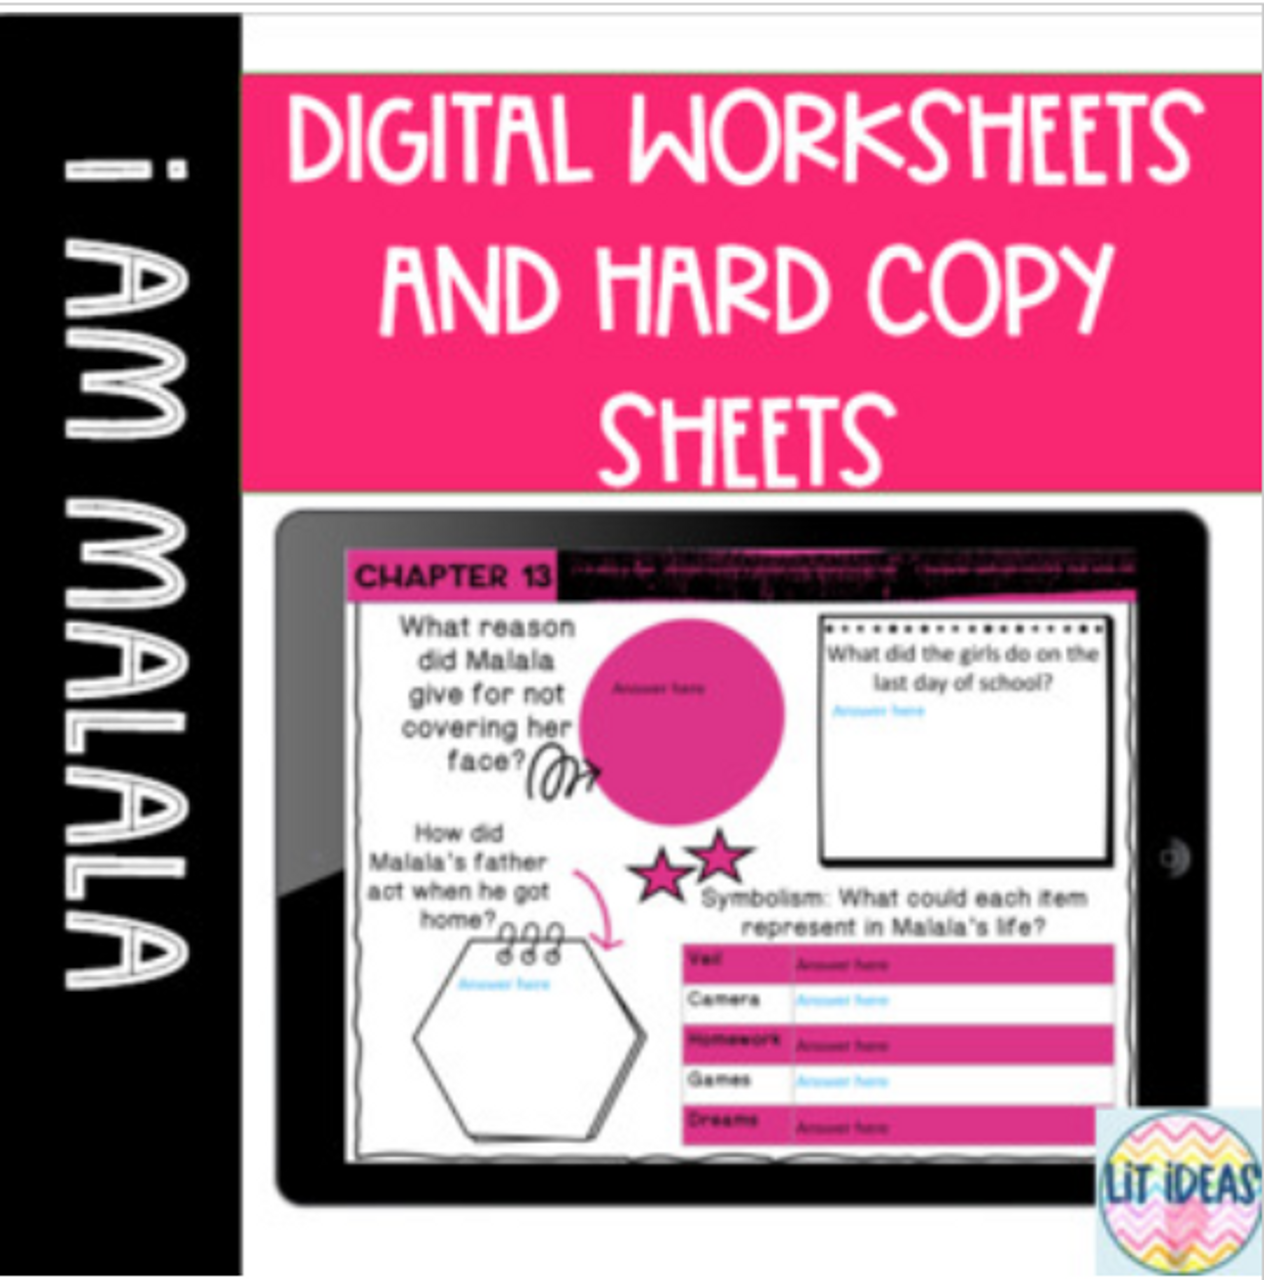 I Am Malala Digital Worksheets and Hard Copies